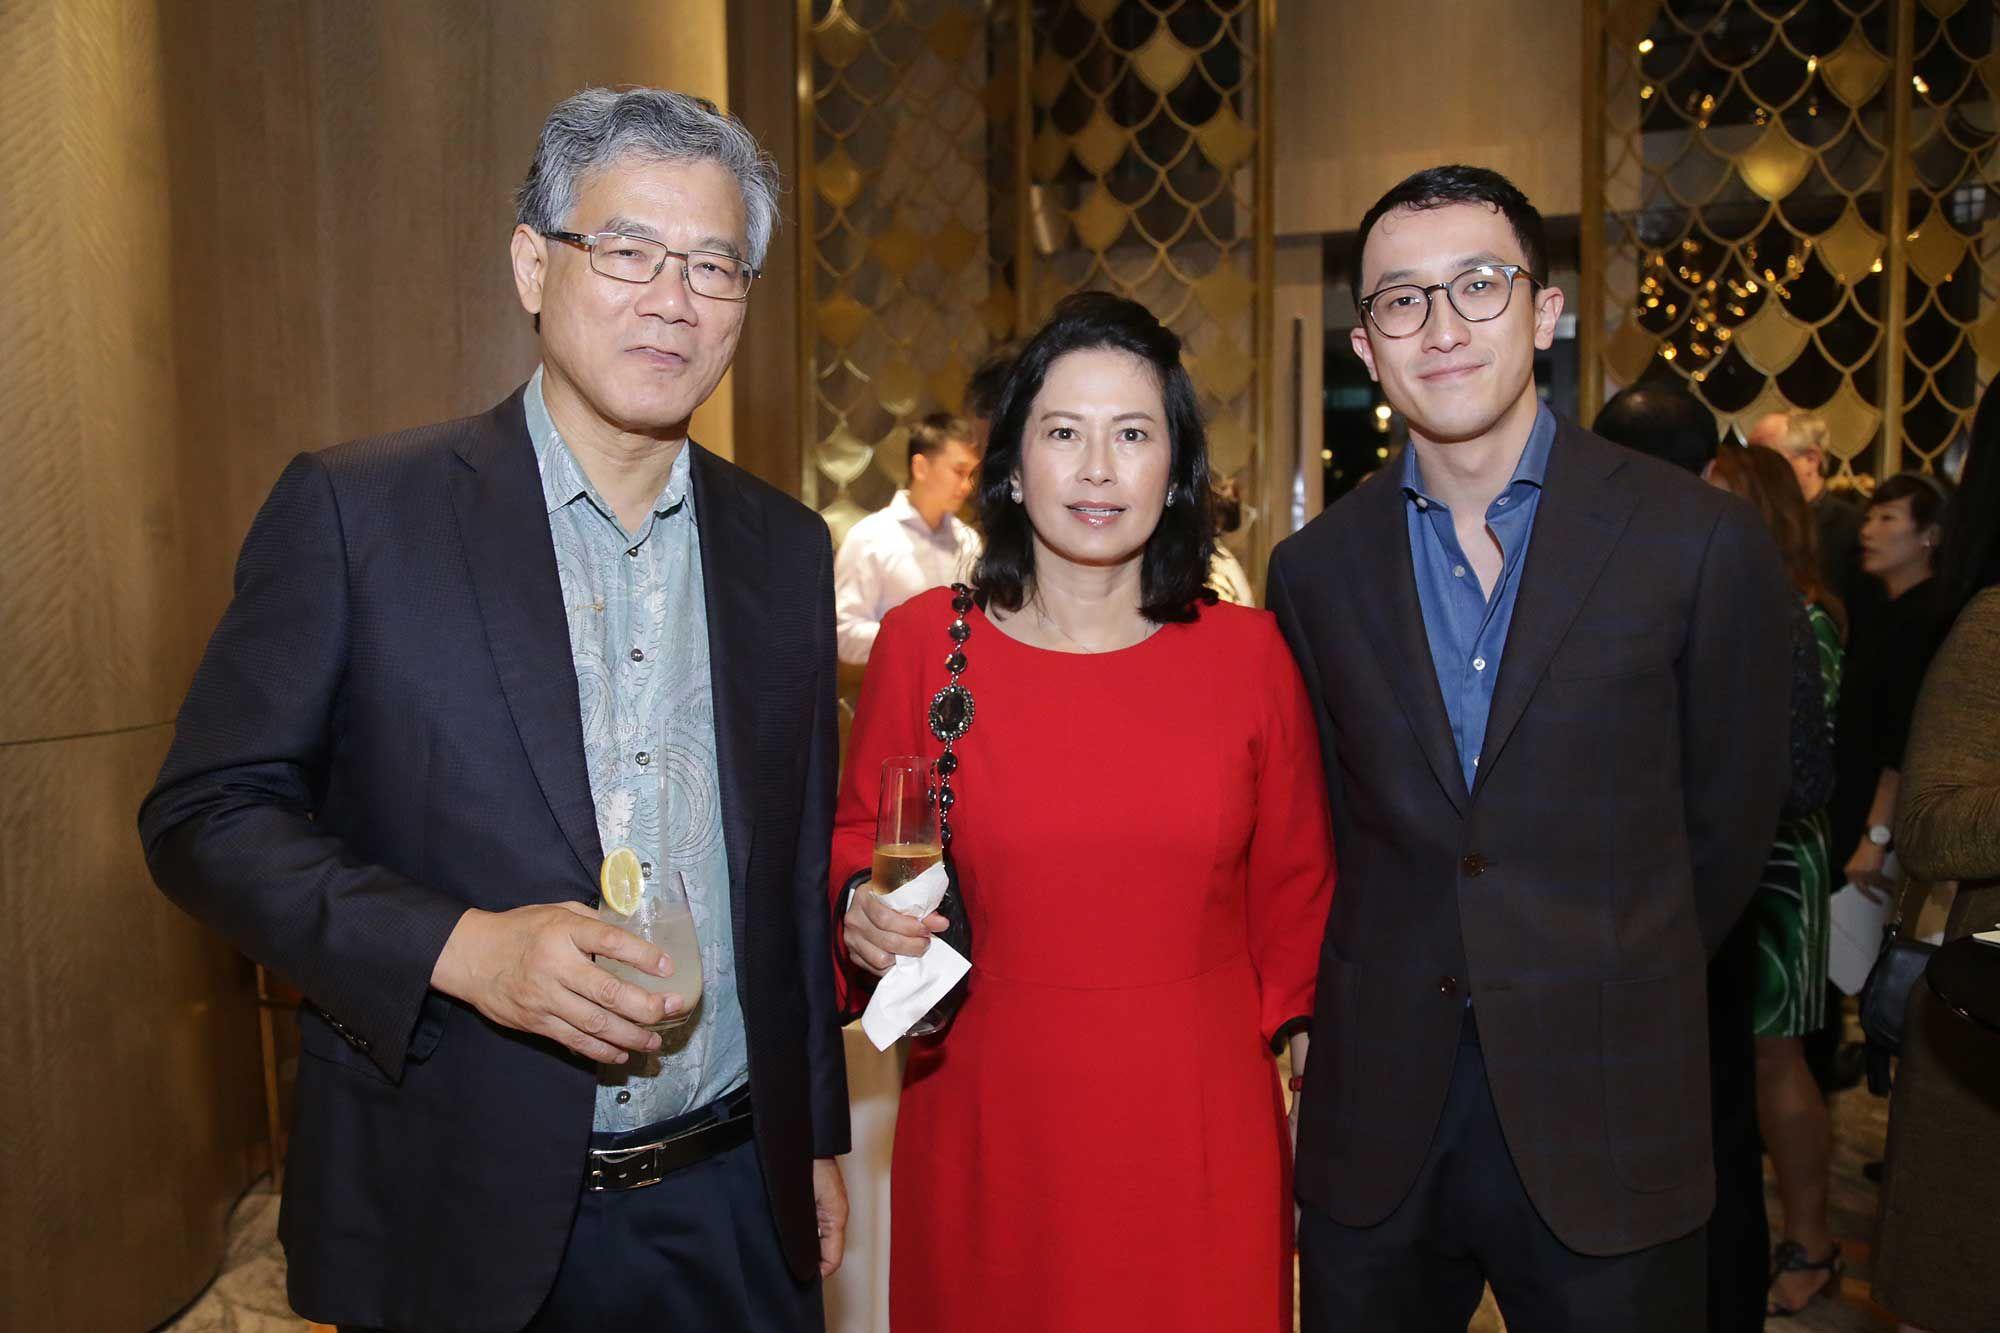 CJ Lim, Irene Lim and Din Tan